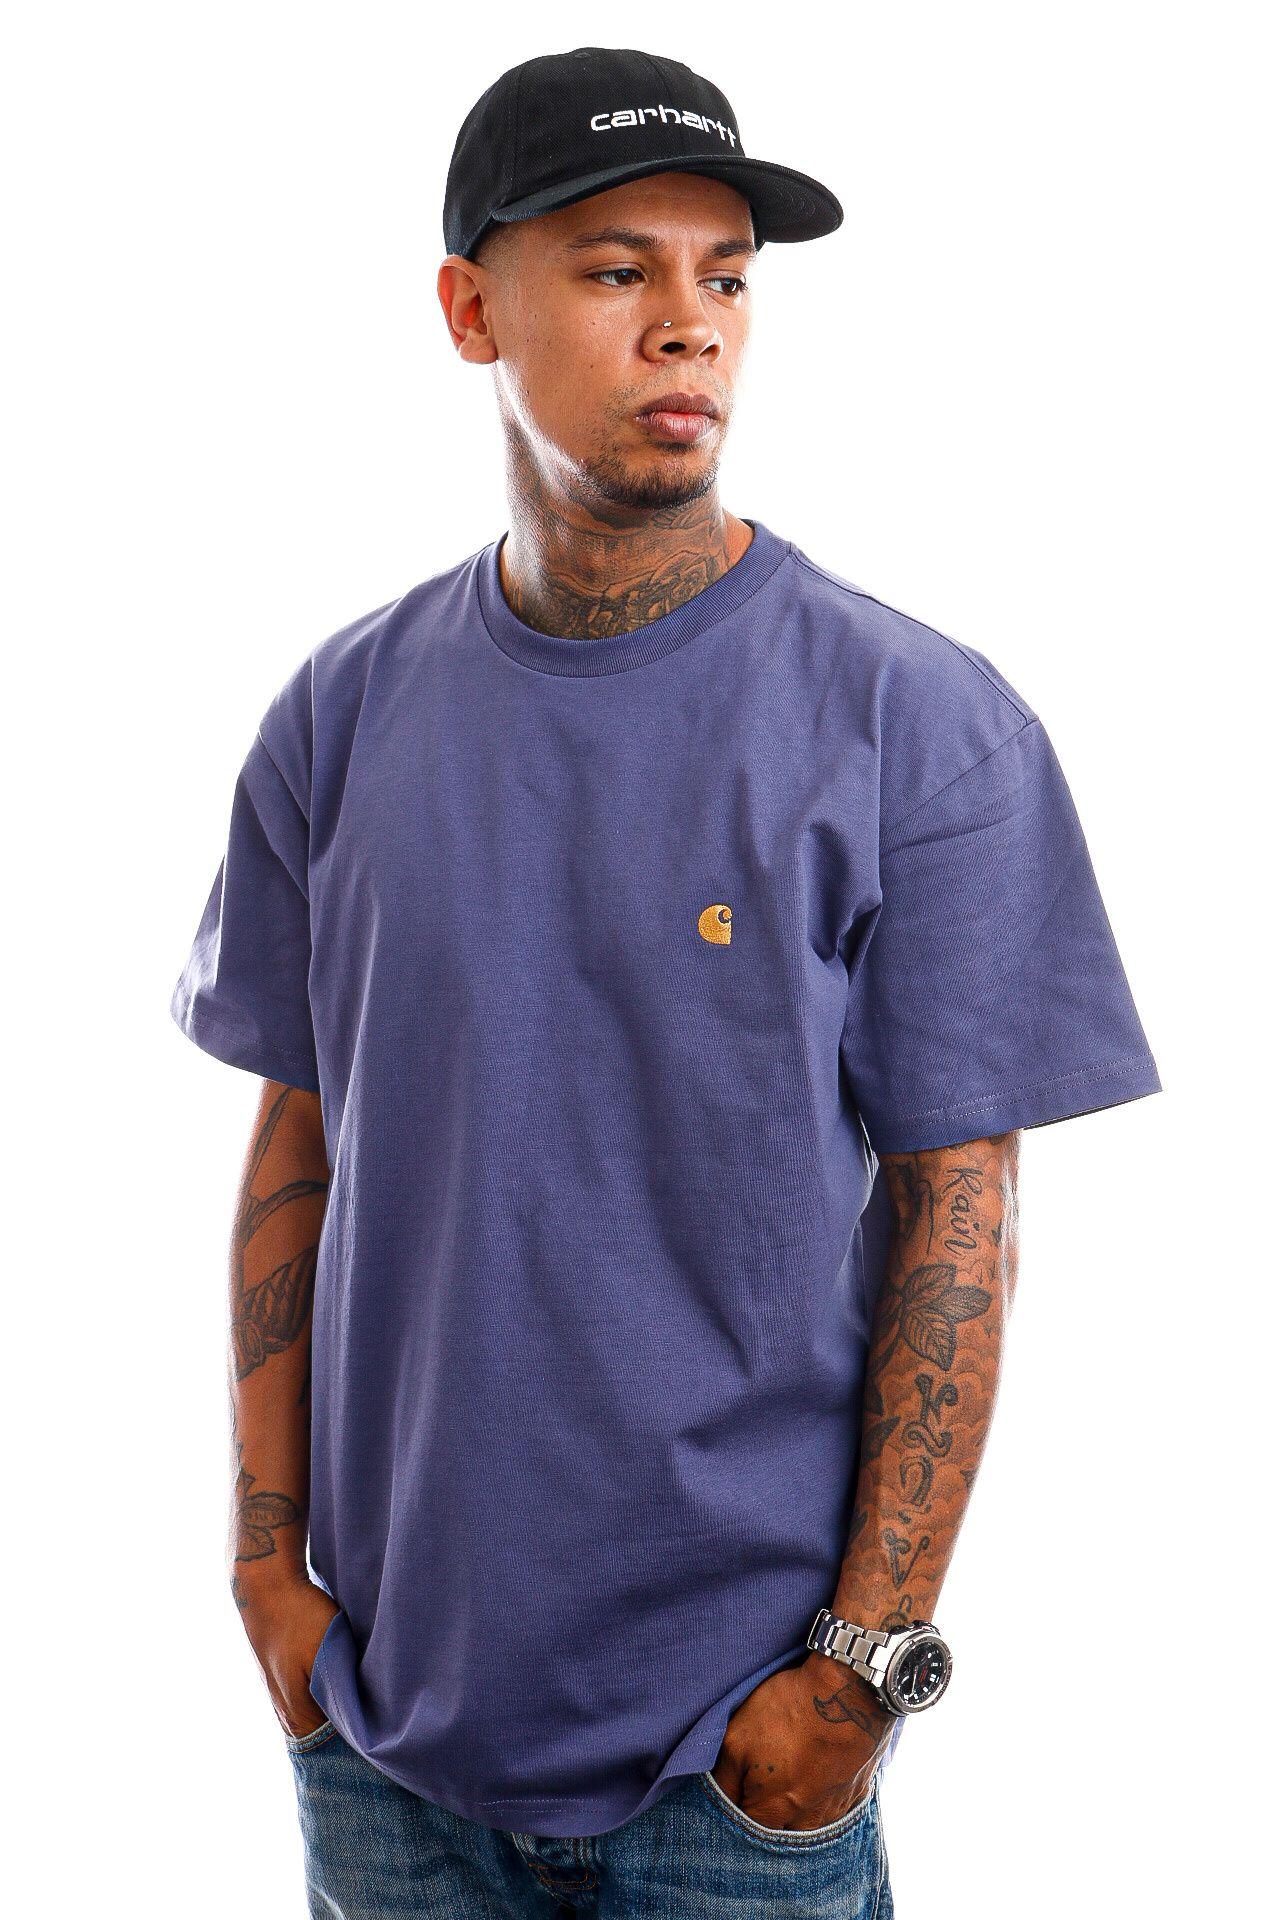 Afbeelding van Carhartt WIP T-Shirt Carhartt S/S Chase Cold Viola / Gold I026391